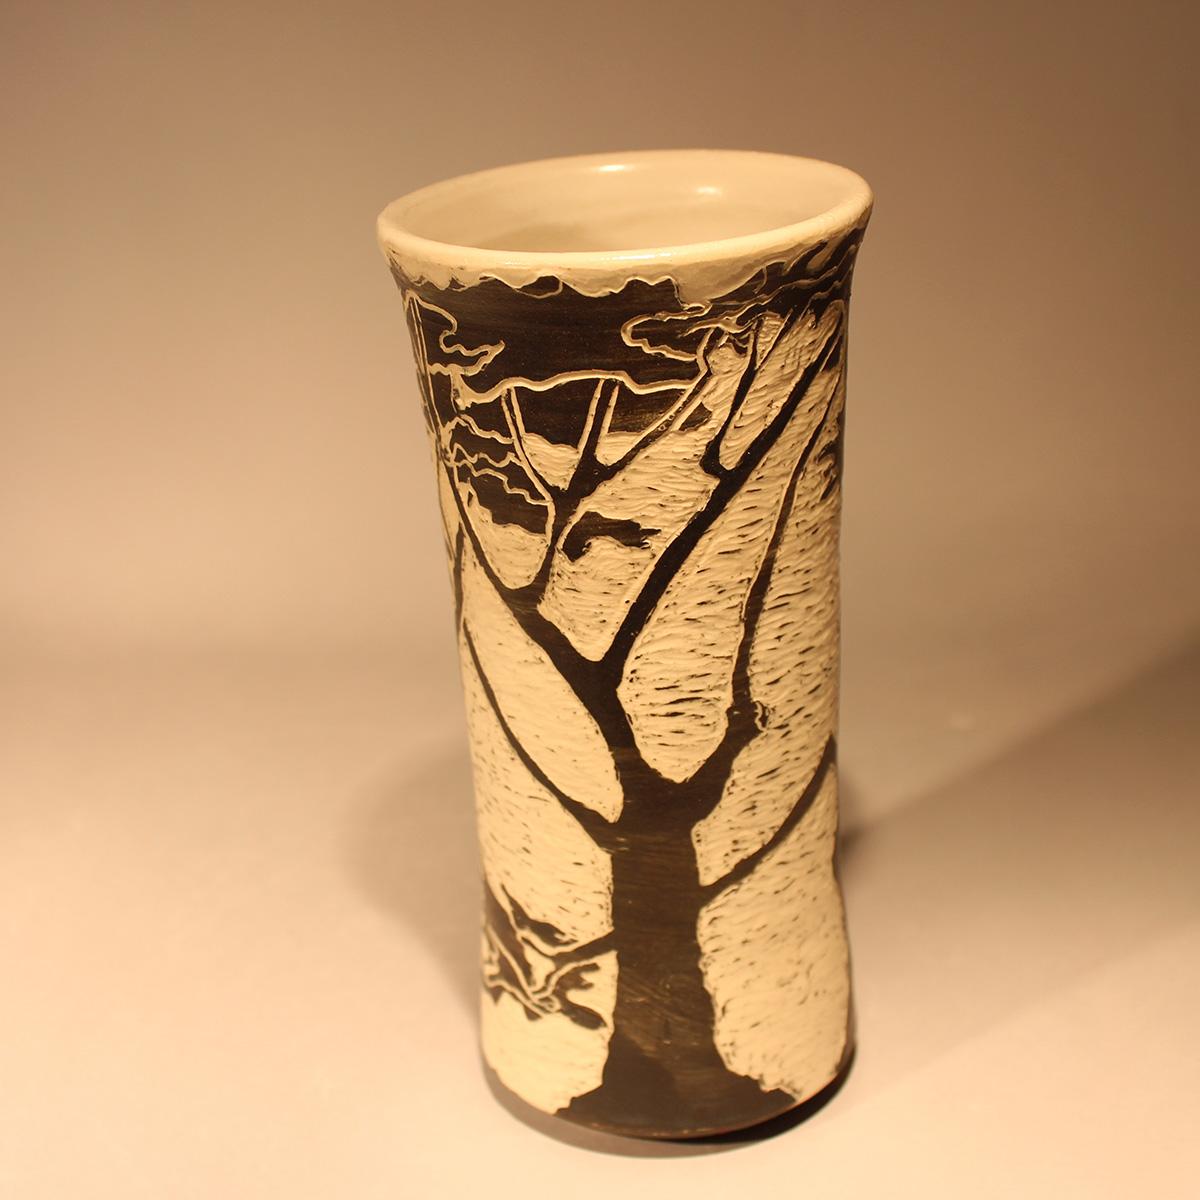 Cypress Tree Vase #1